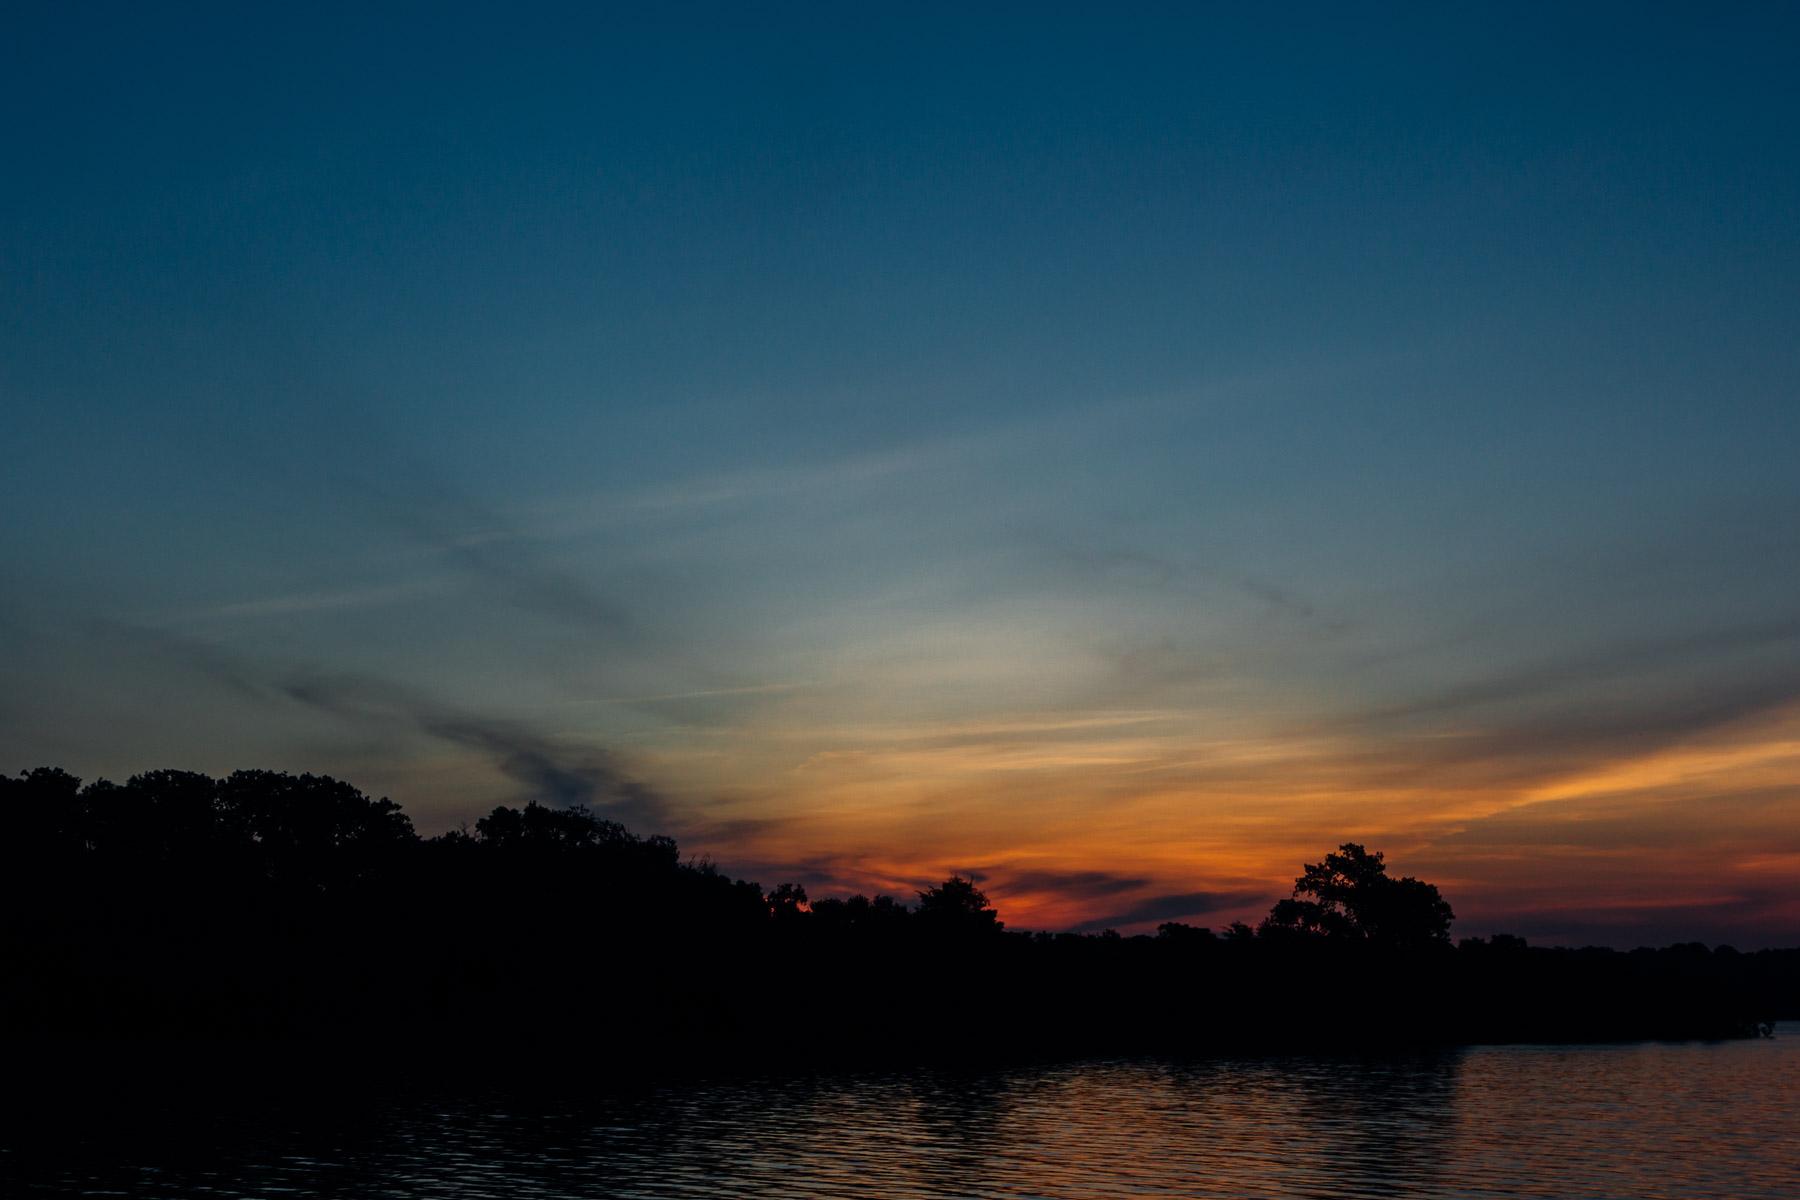 Lakeside Sunrise | Dallas-Fort Worth | 75CentralPhotography